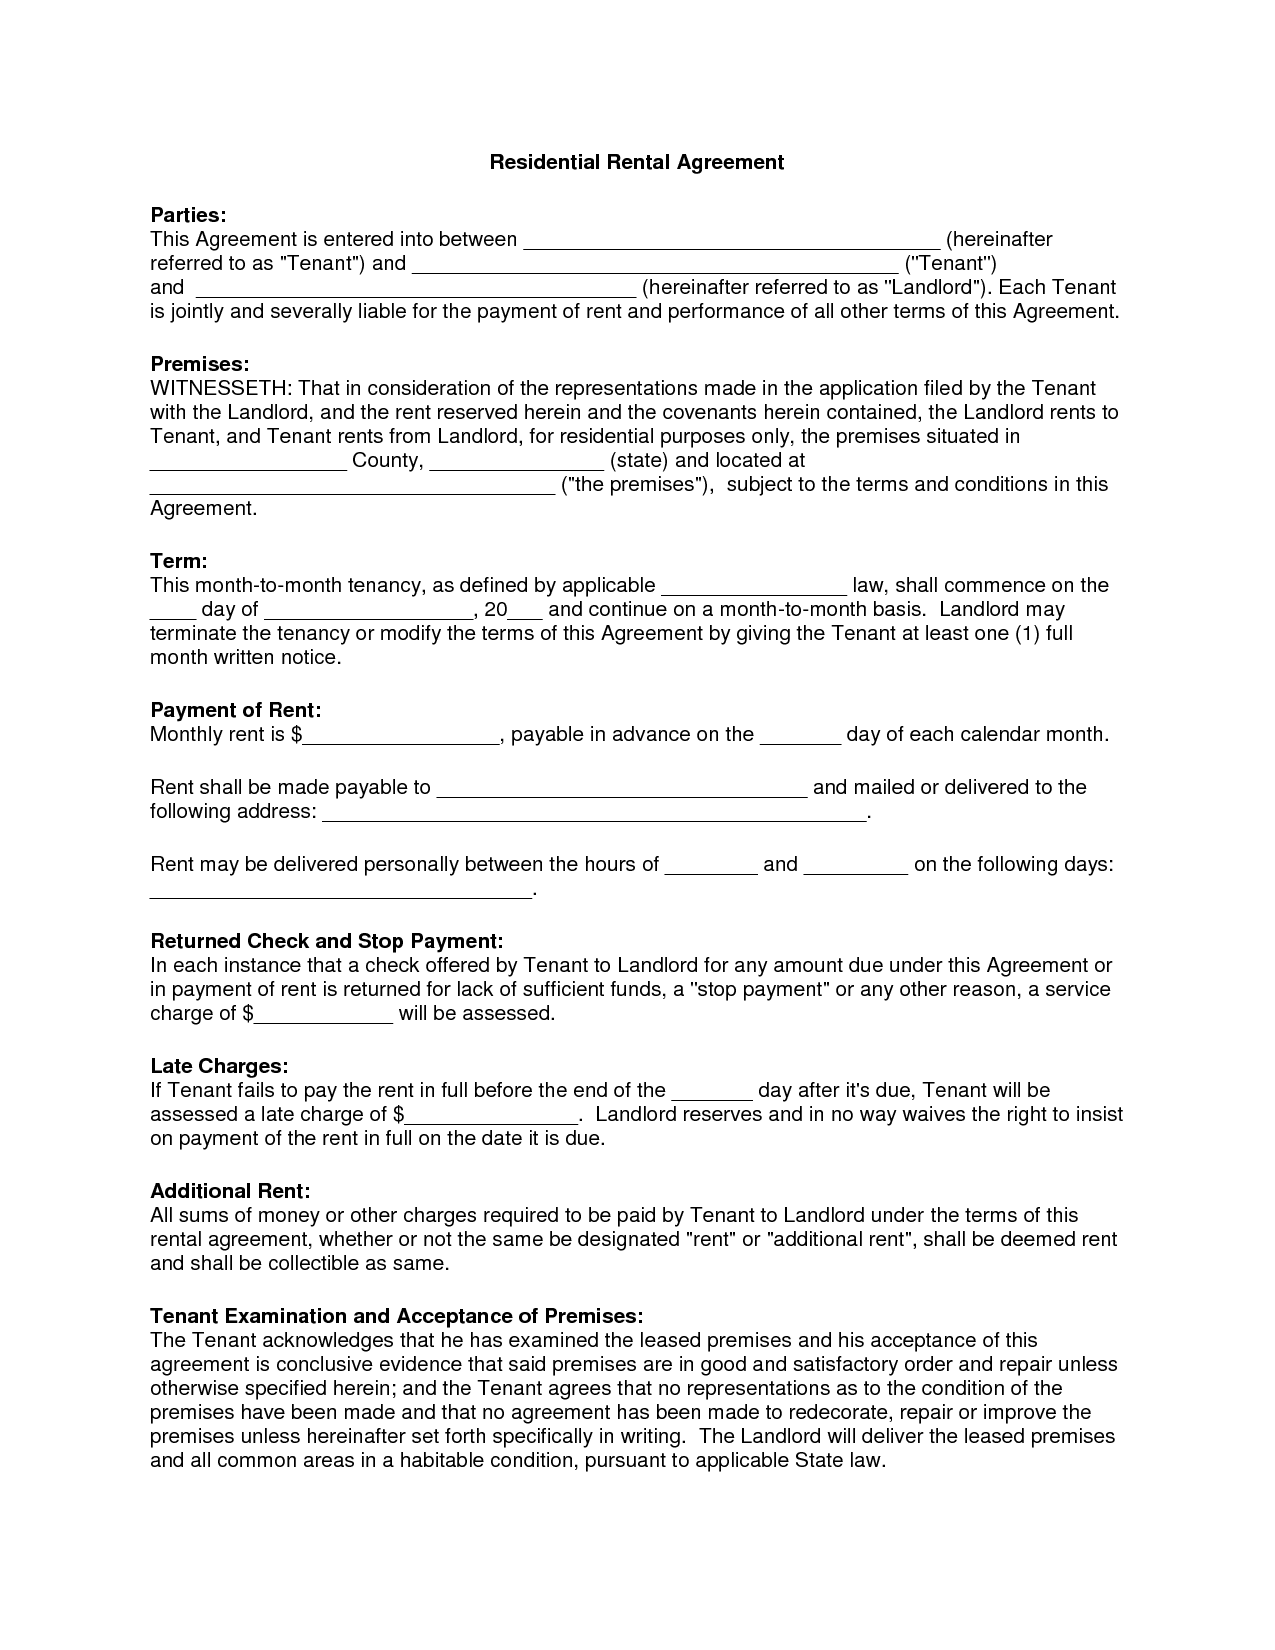 Residential Rental Agreement Rental Agreement Templates Lease Agreement Lease Agreement Free Printable